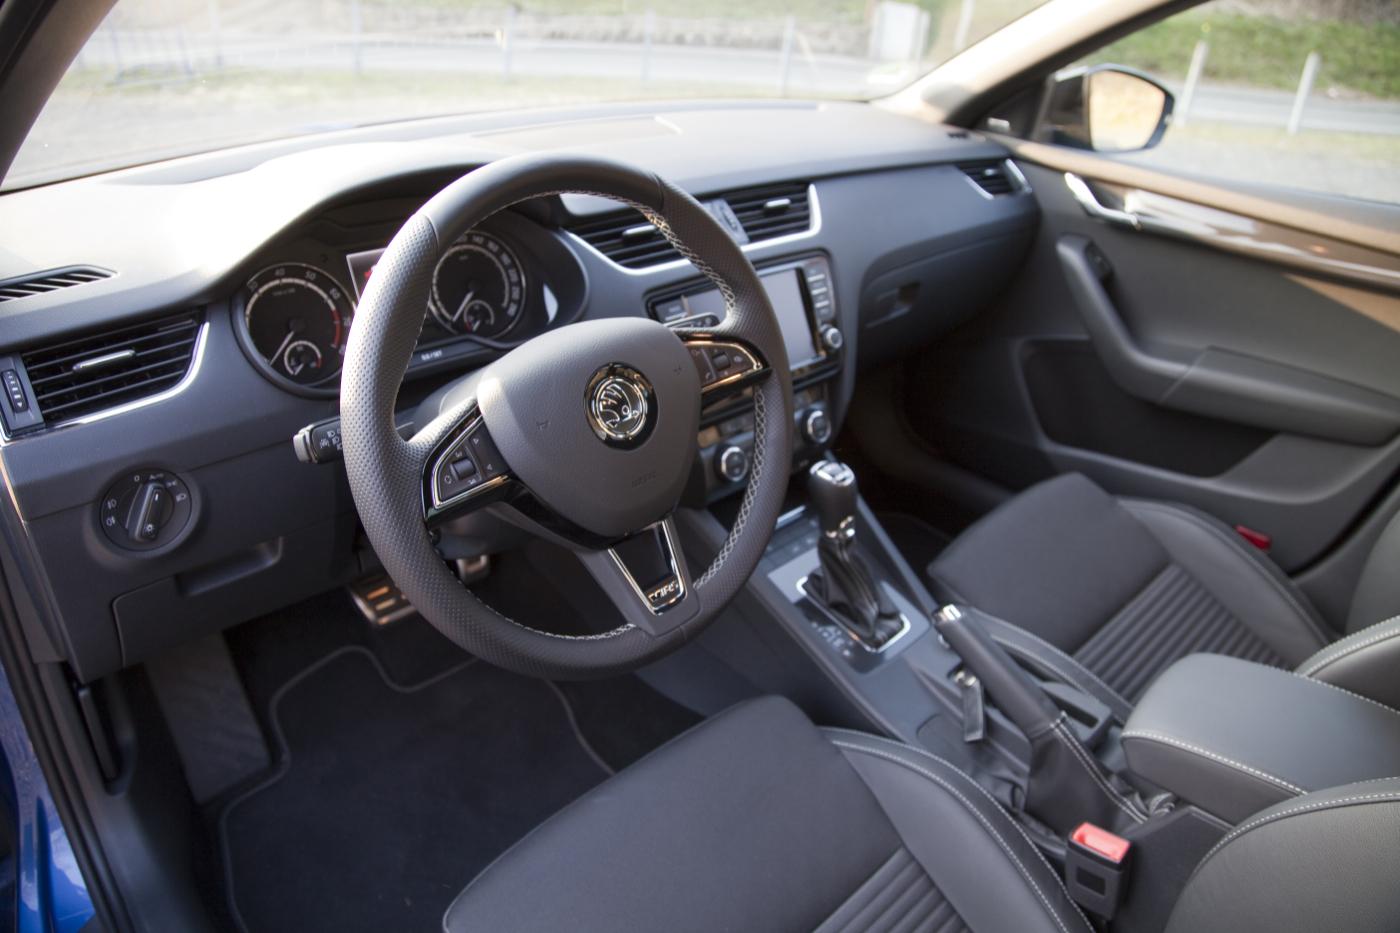 Skoda Octavia Combi RS - Innenraum Foto: Thomas Blachetzki